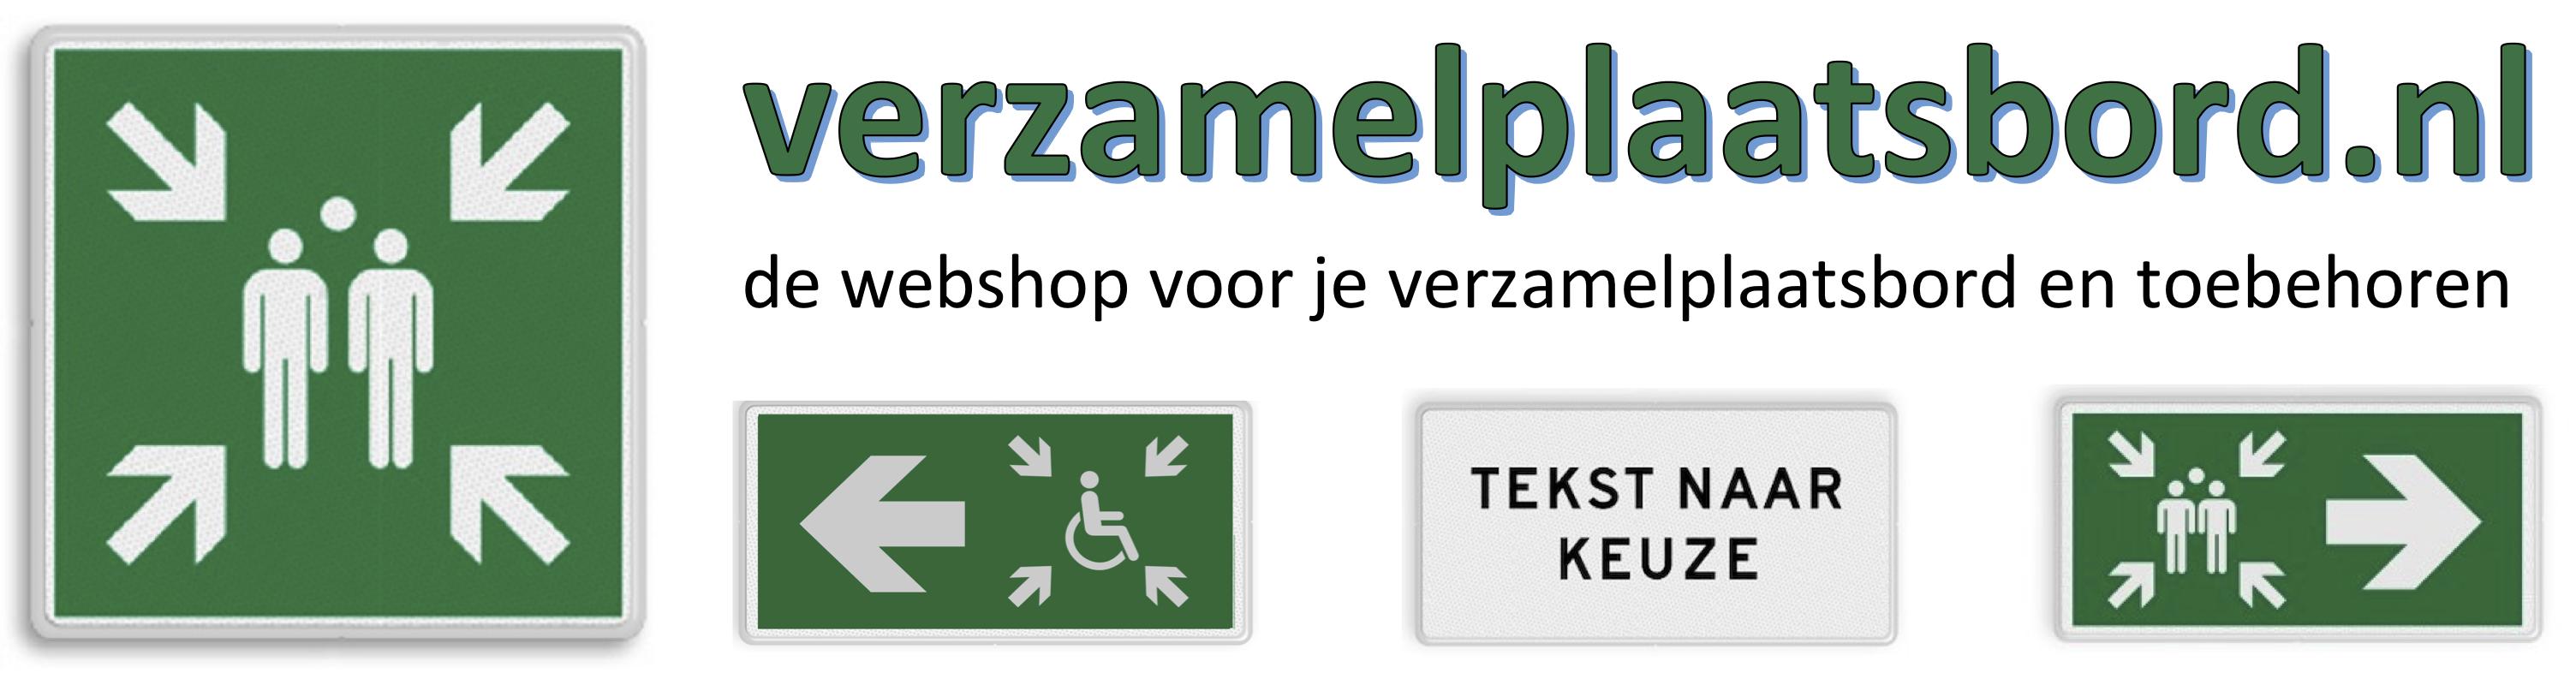 verzamelplaatsbord.nl